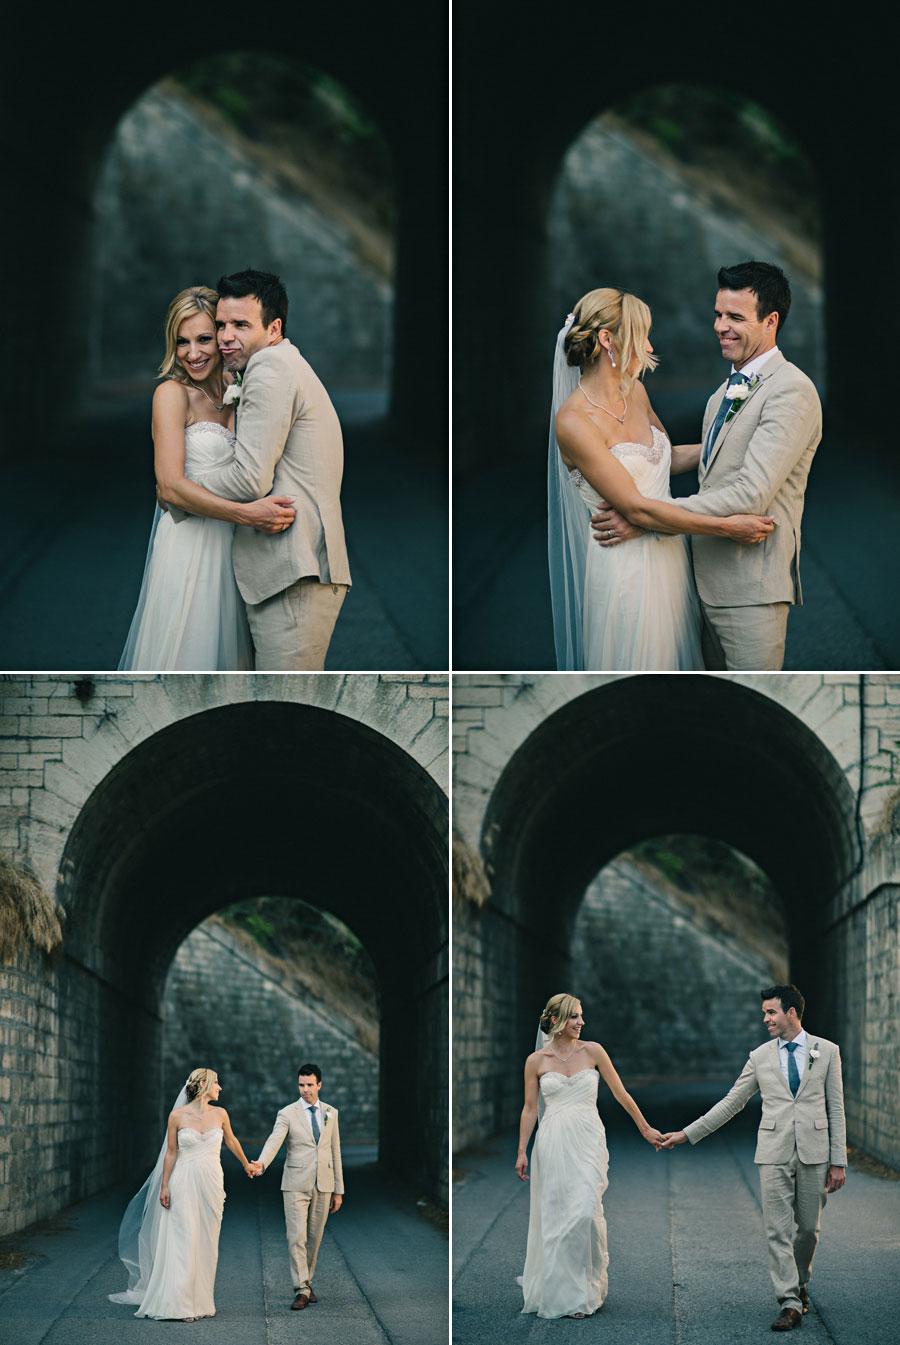 wedding-provence-france-055.jpg